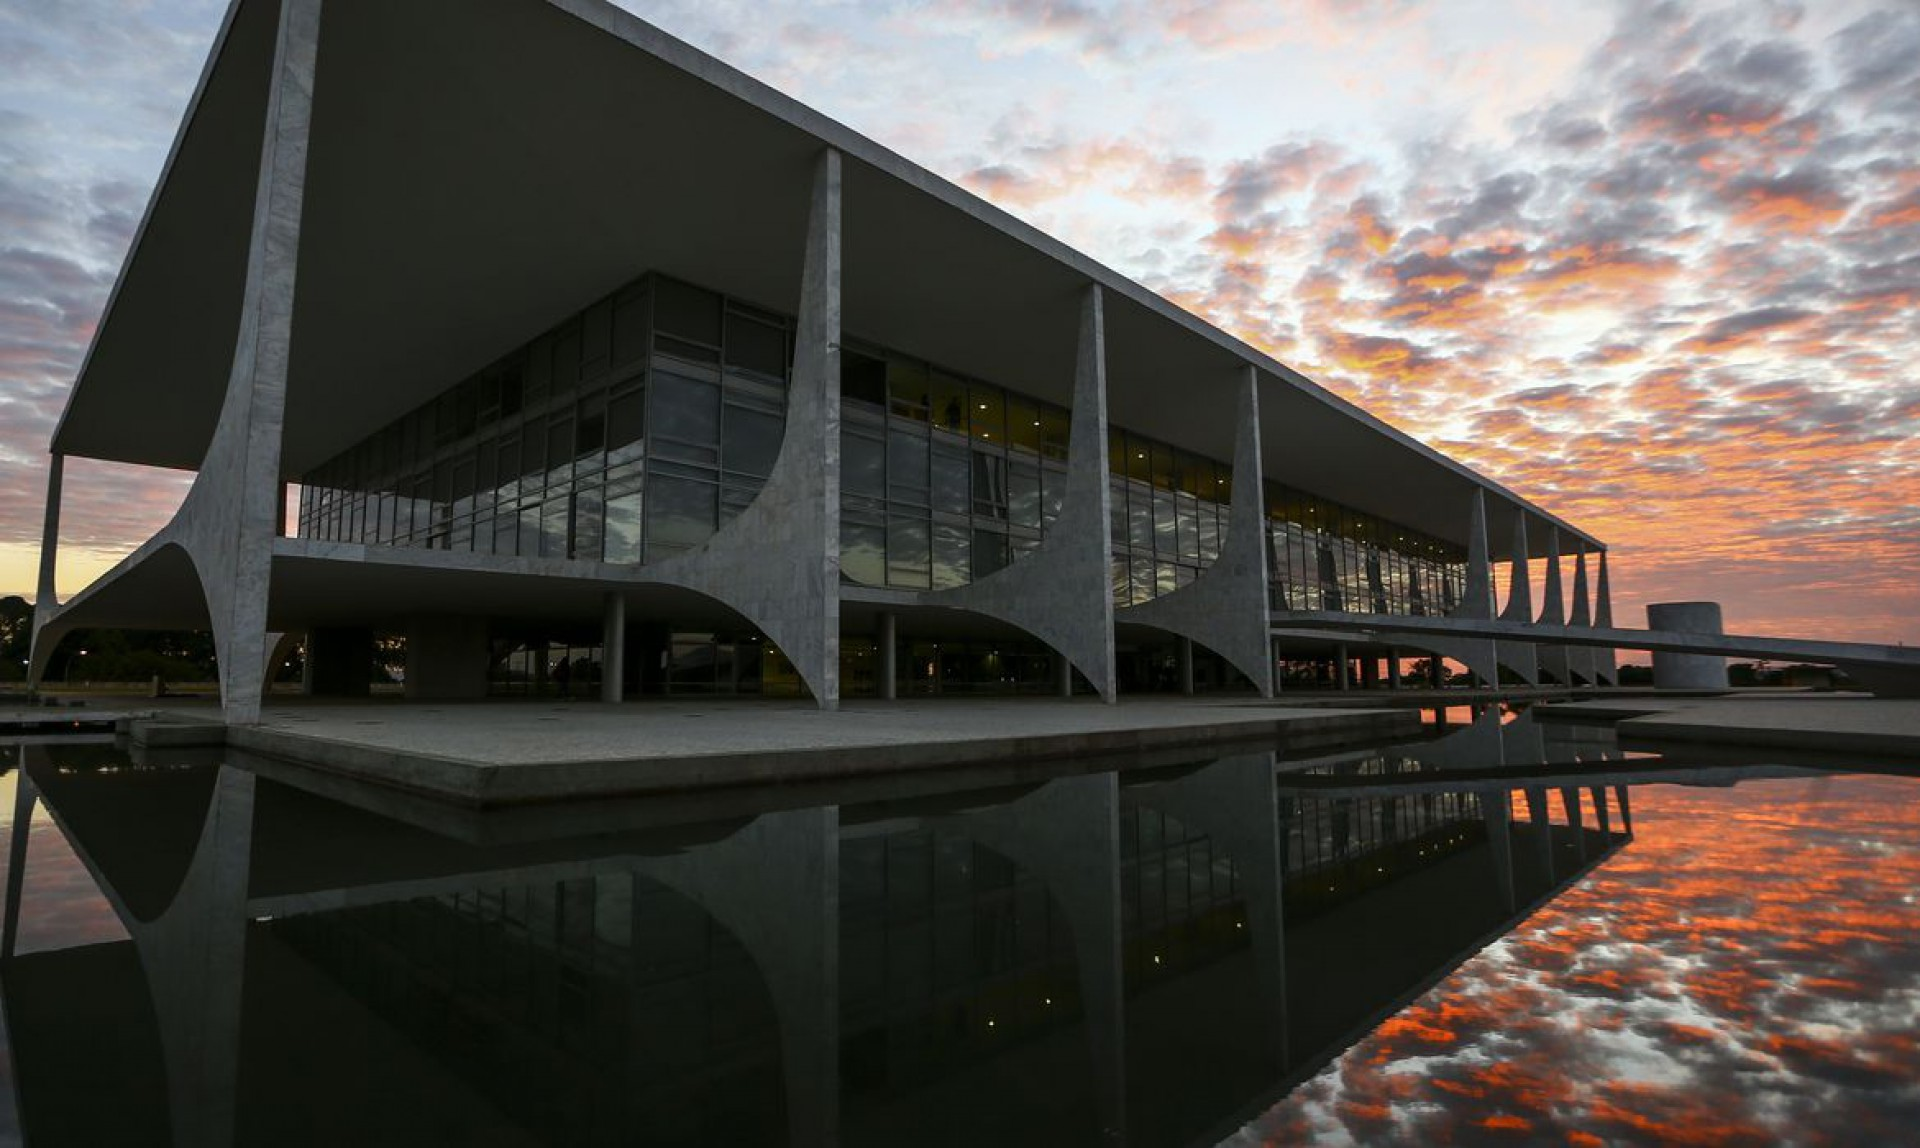 Palácio do Planalto. (Foto: Marcelo Camargo/Agência Brasil)